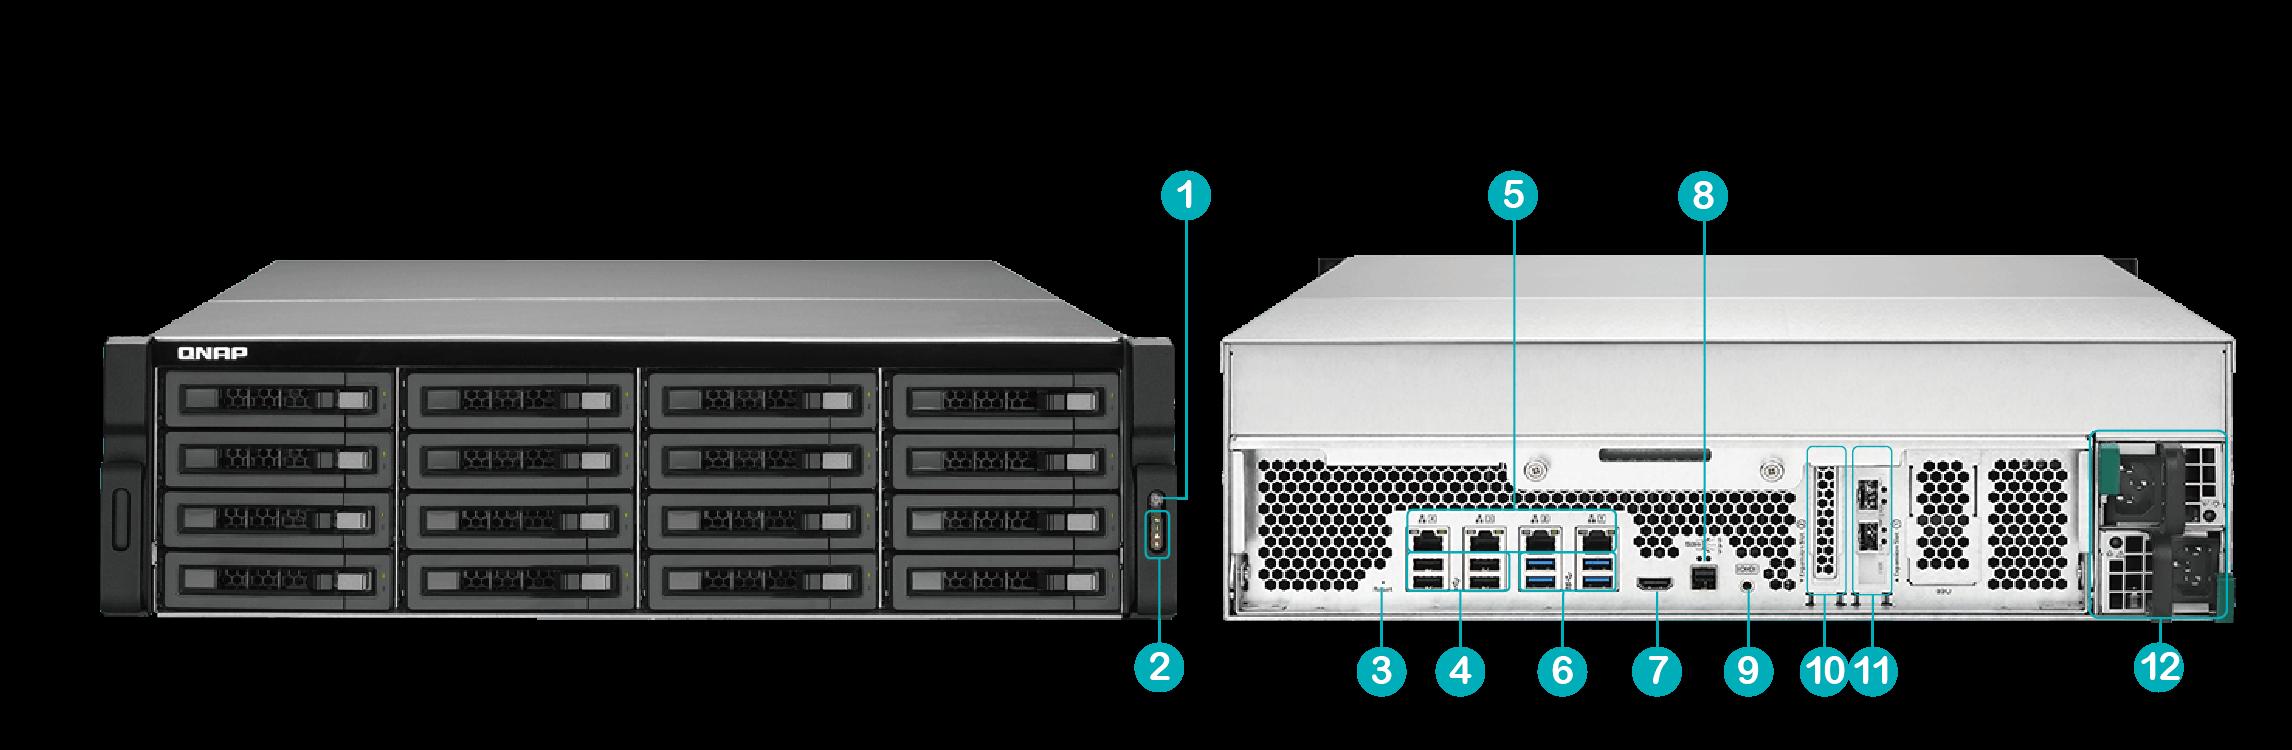 QNAP NAS TVS-EC1680MU-SAS-RP R2